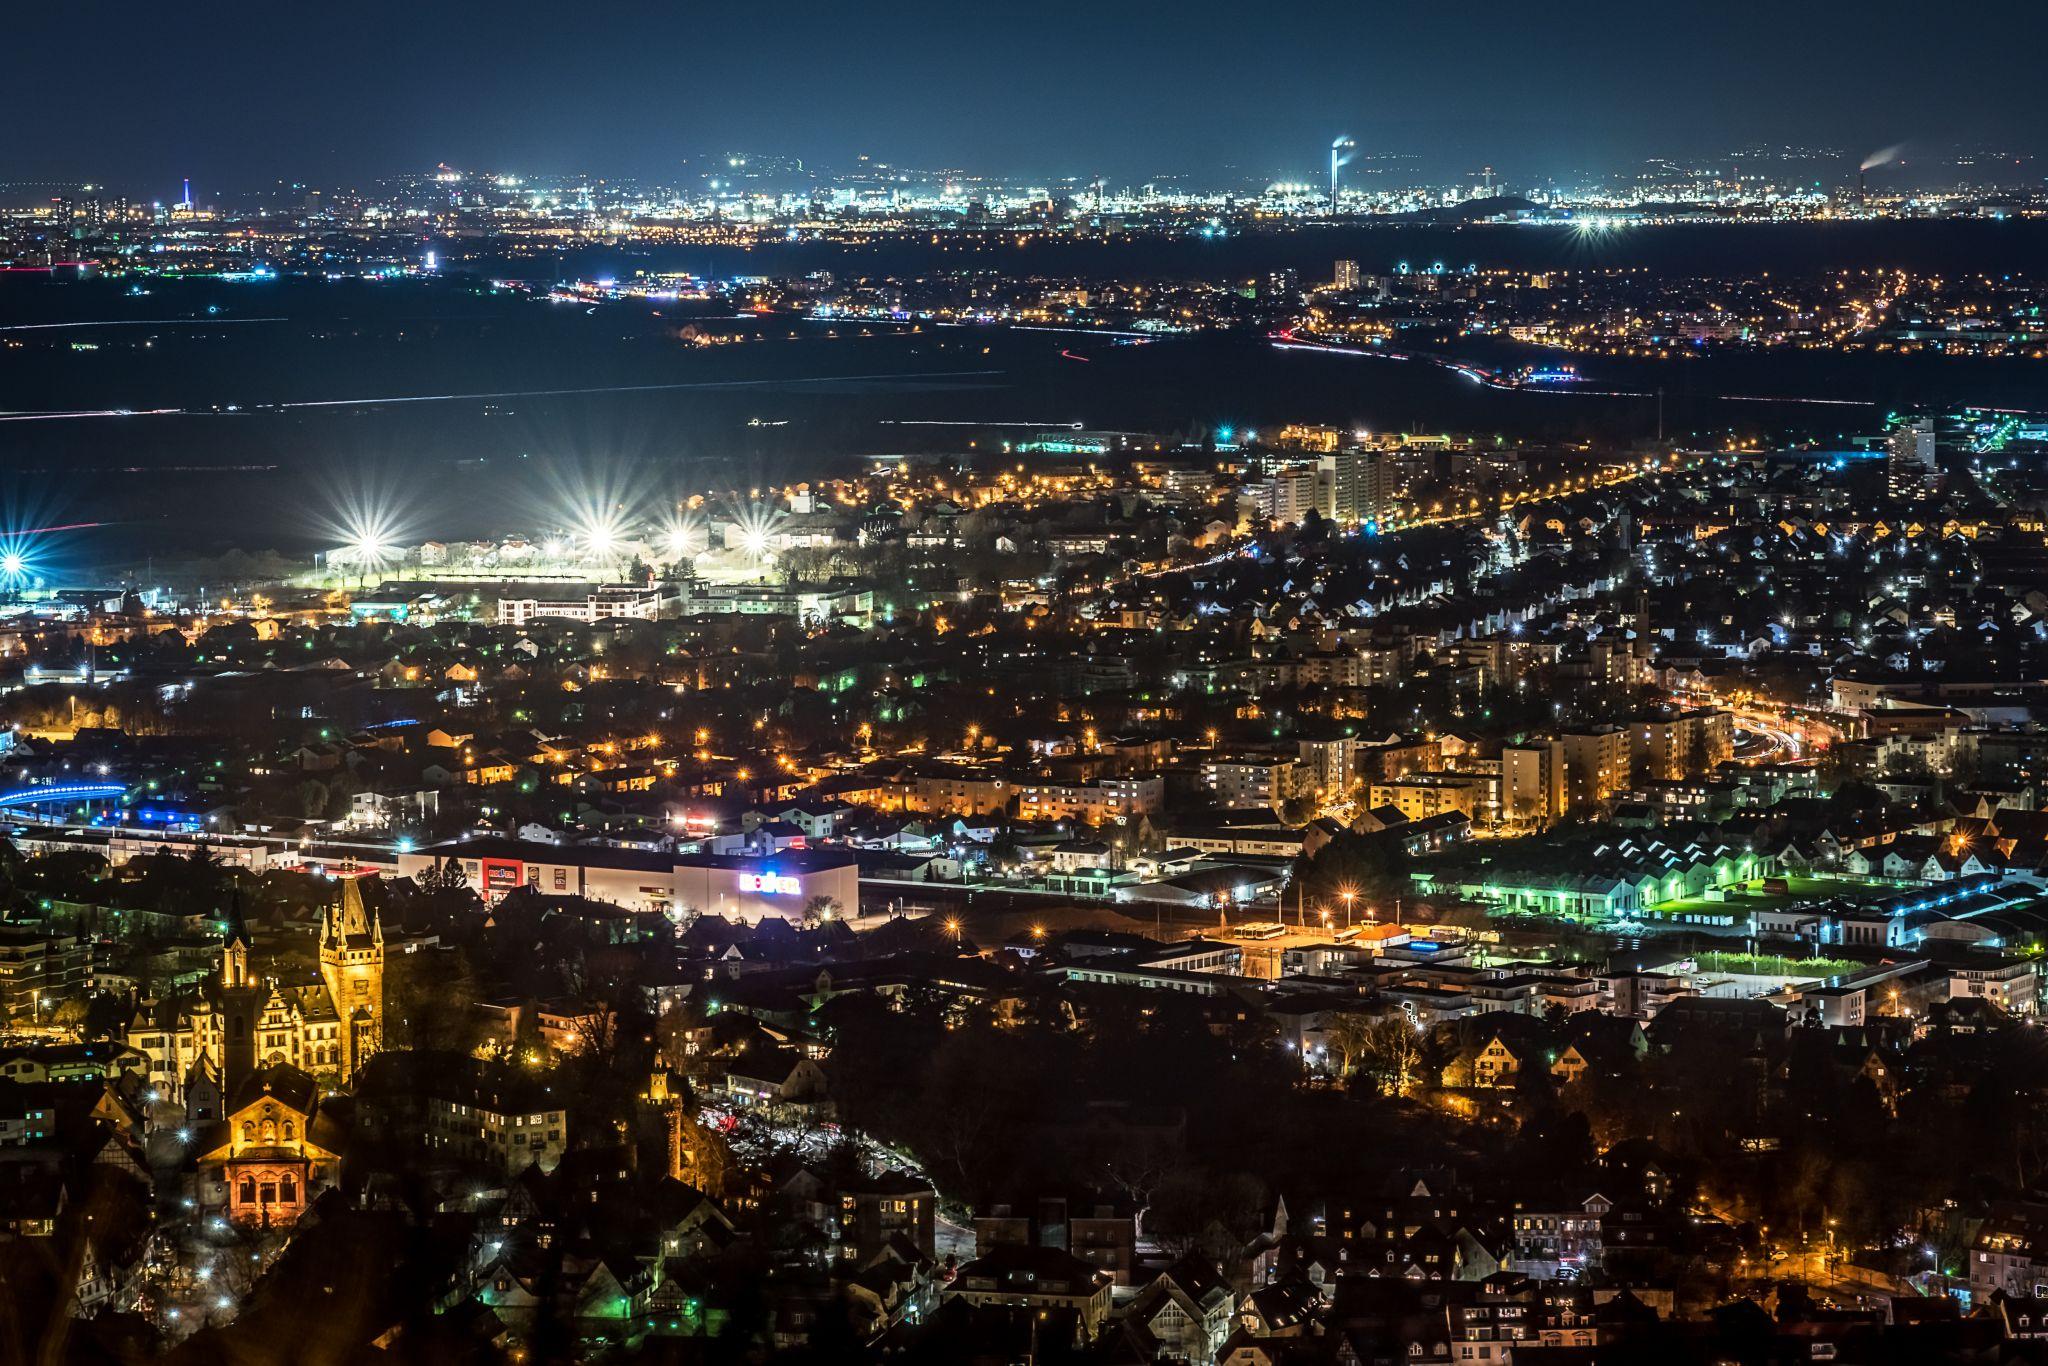 Weinheim city from Wachenburg, Germany